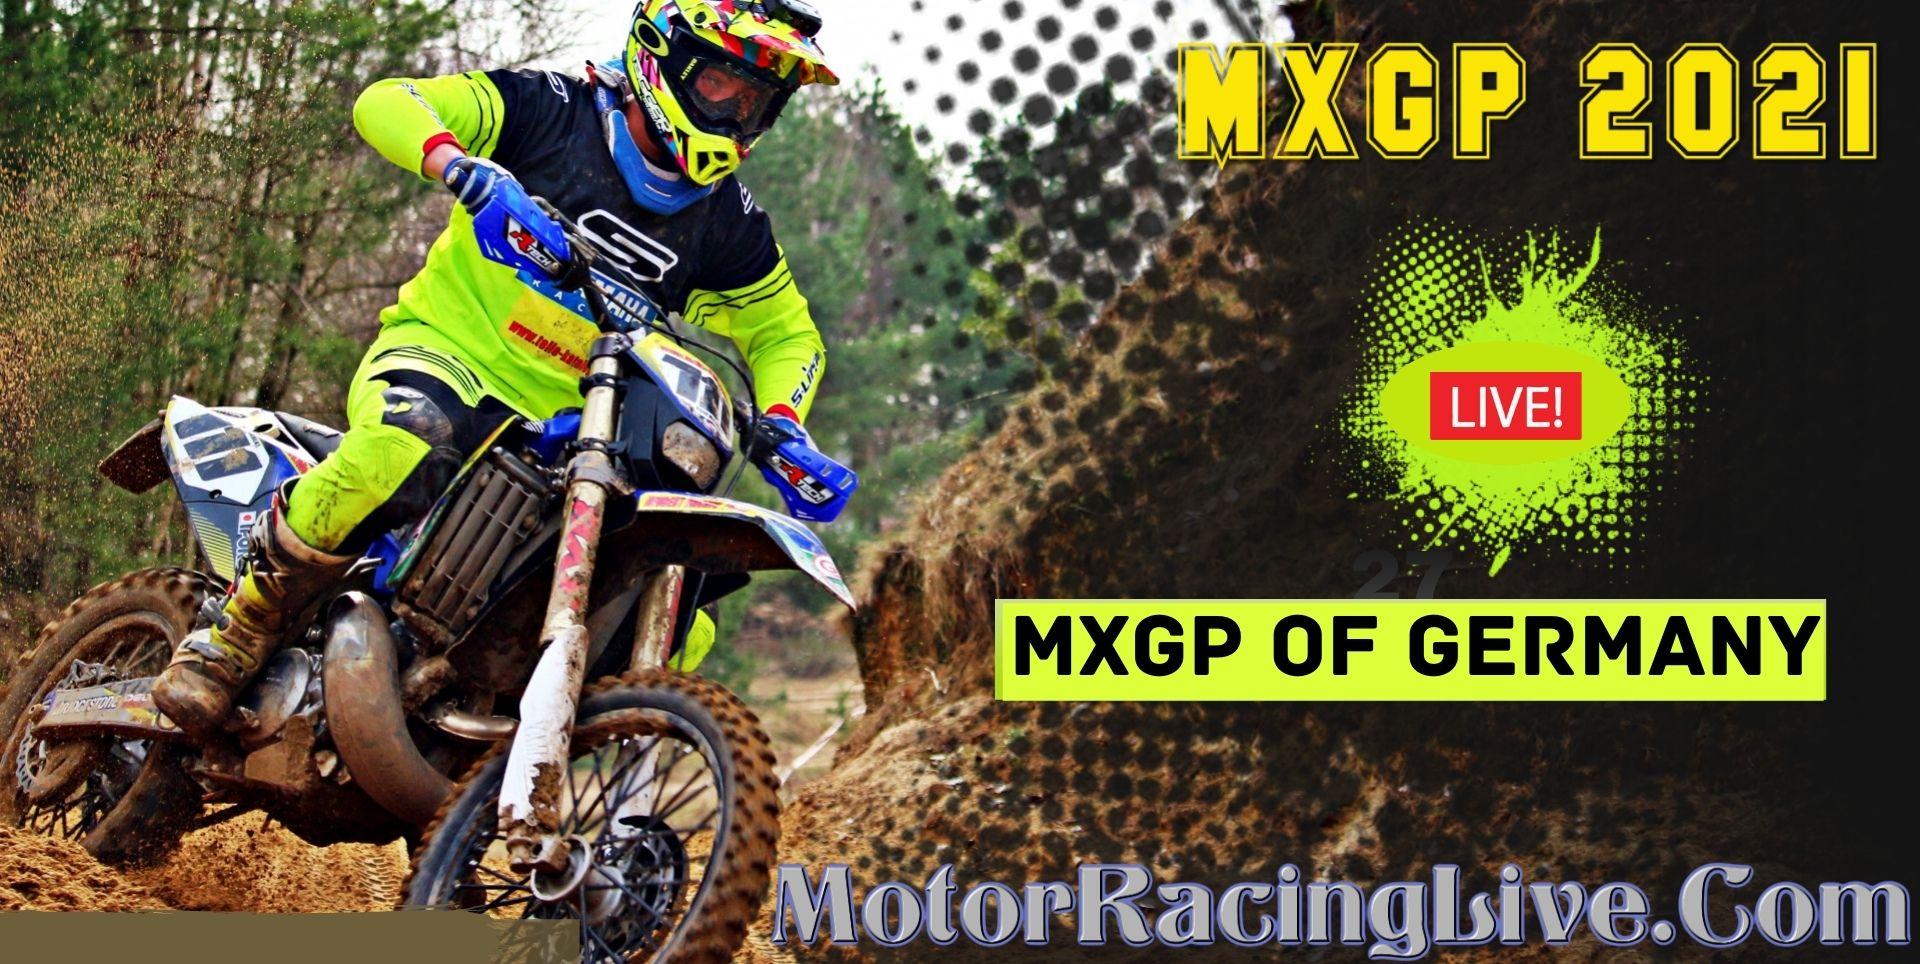 MXGP OF GERMANY 2021 Live Stream